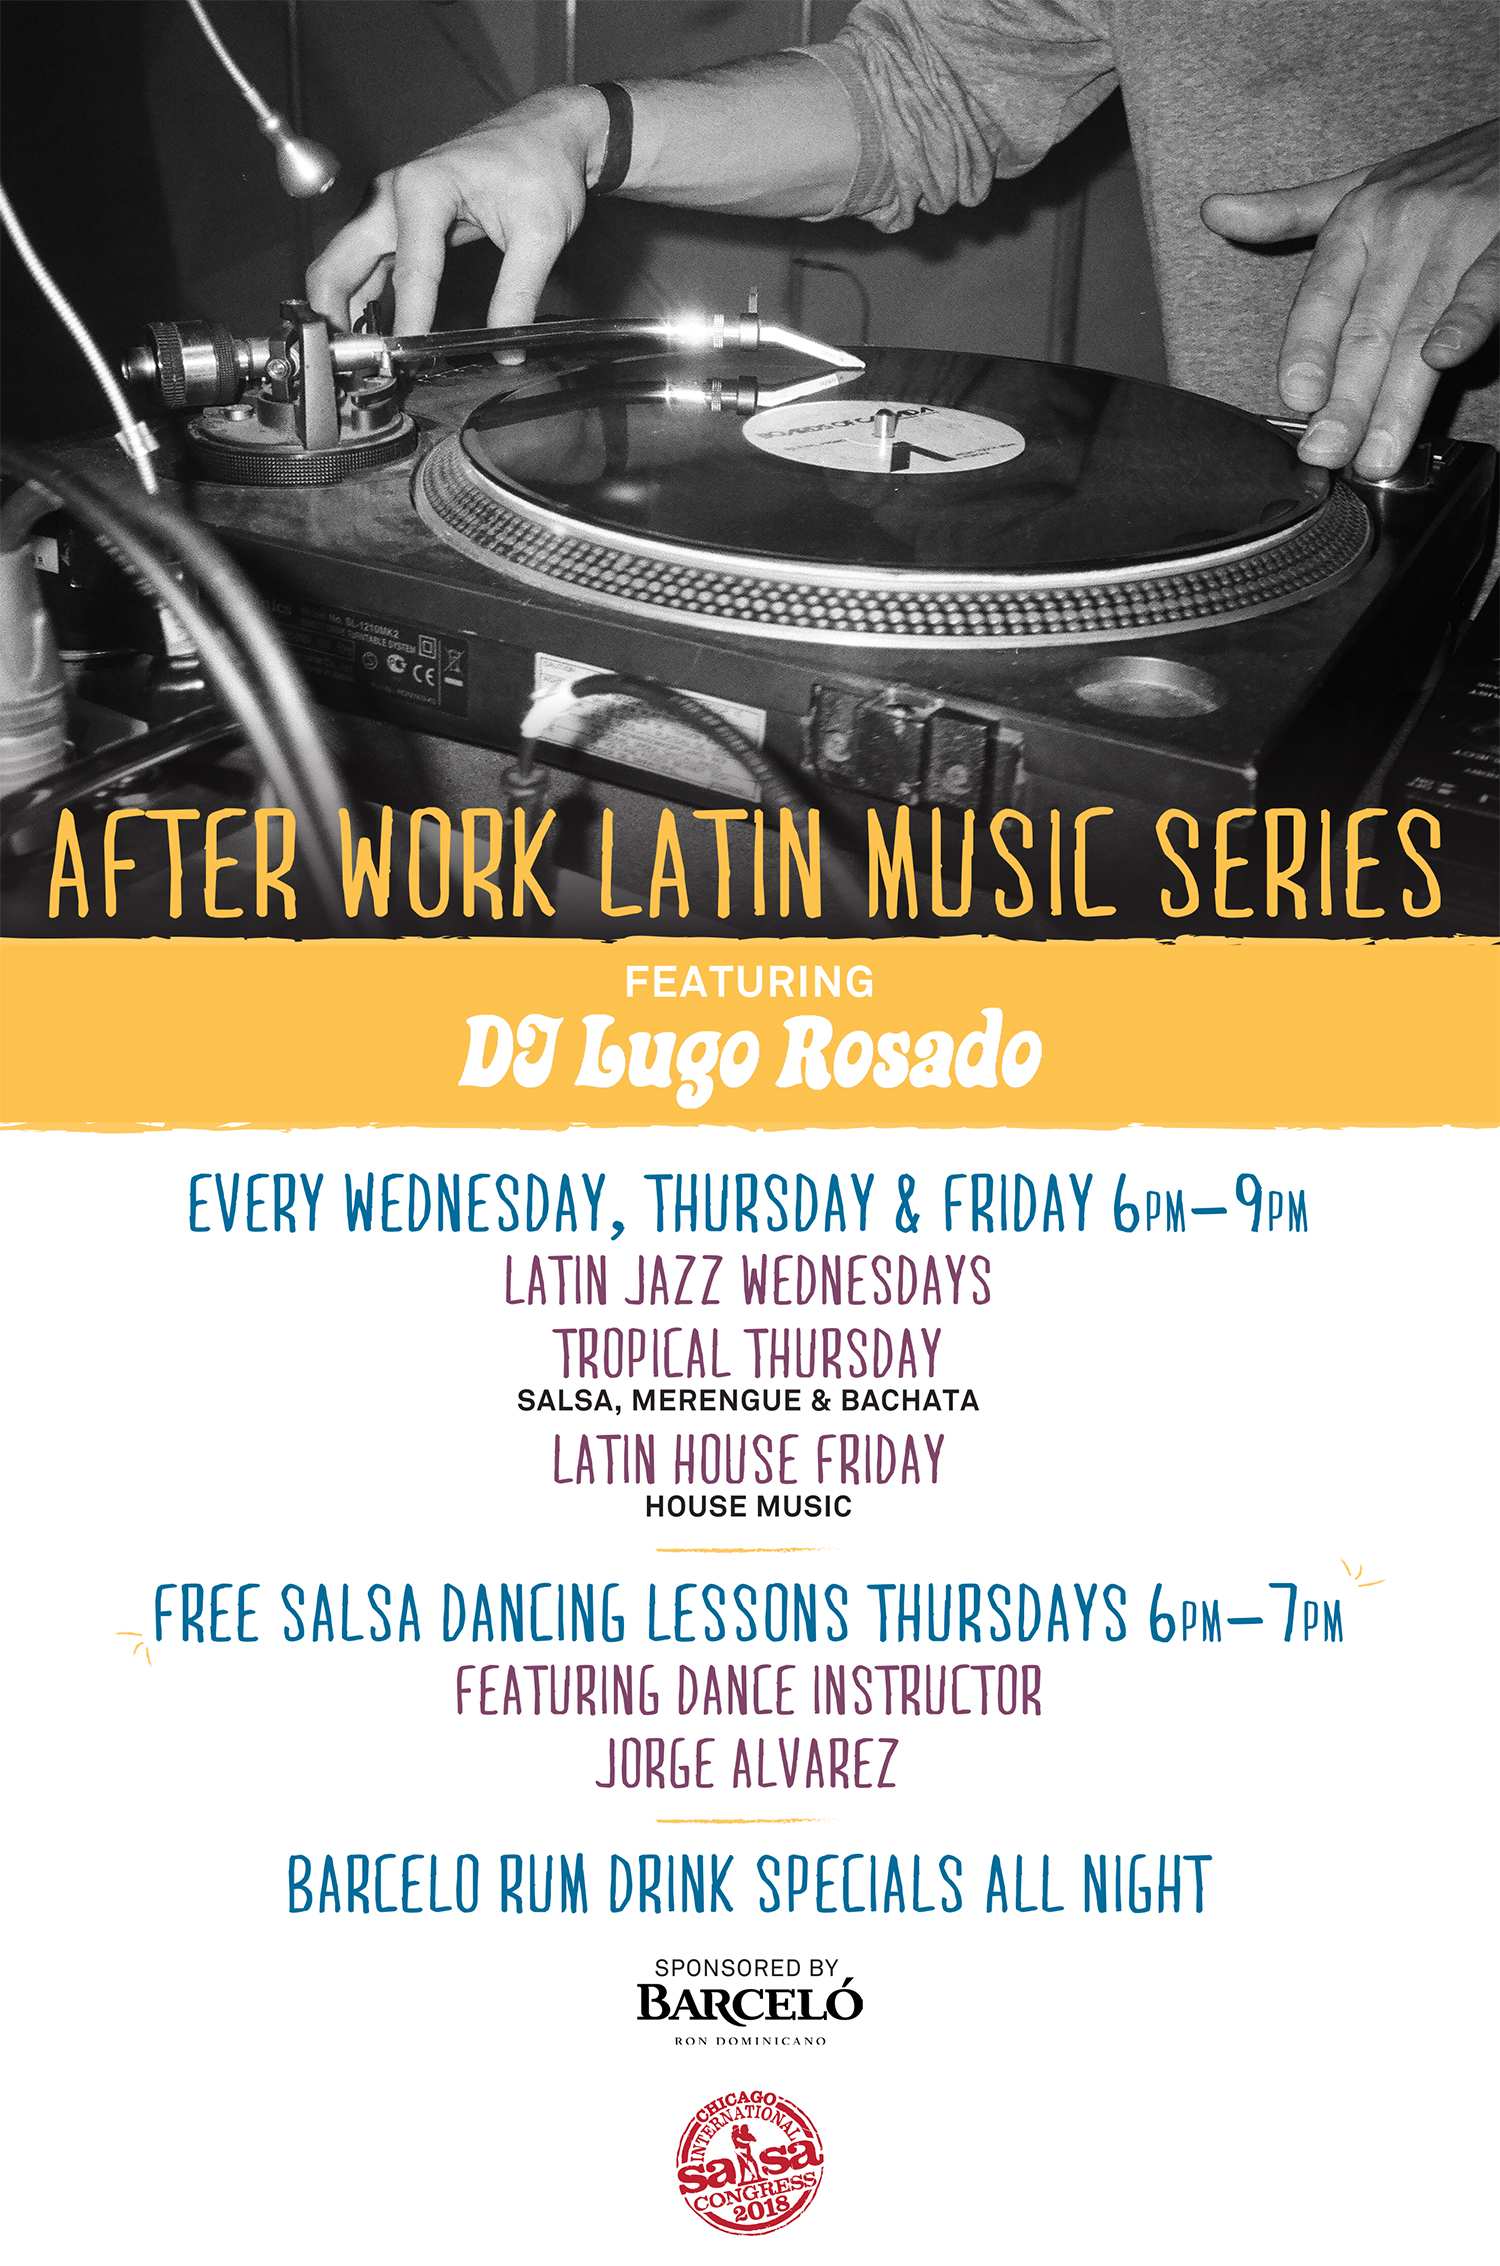 Latinicity_LatinMusicSeries_Web_8.7.18.jpg